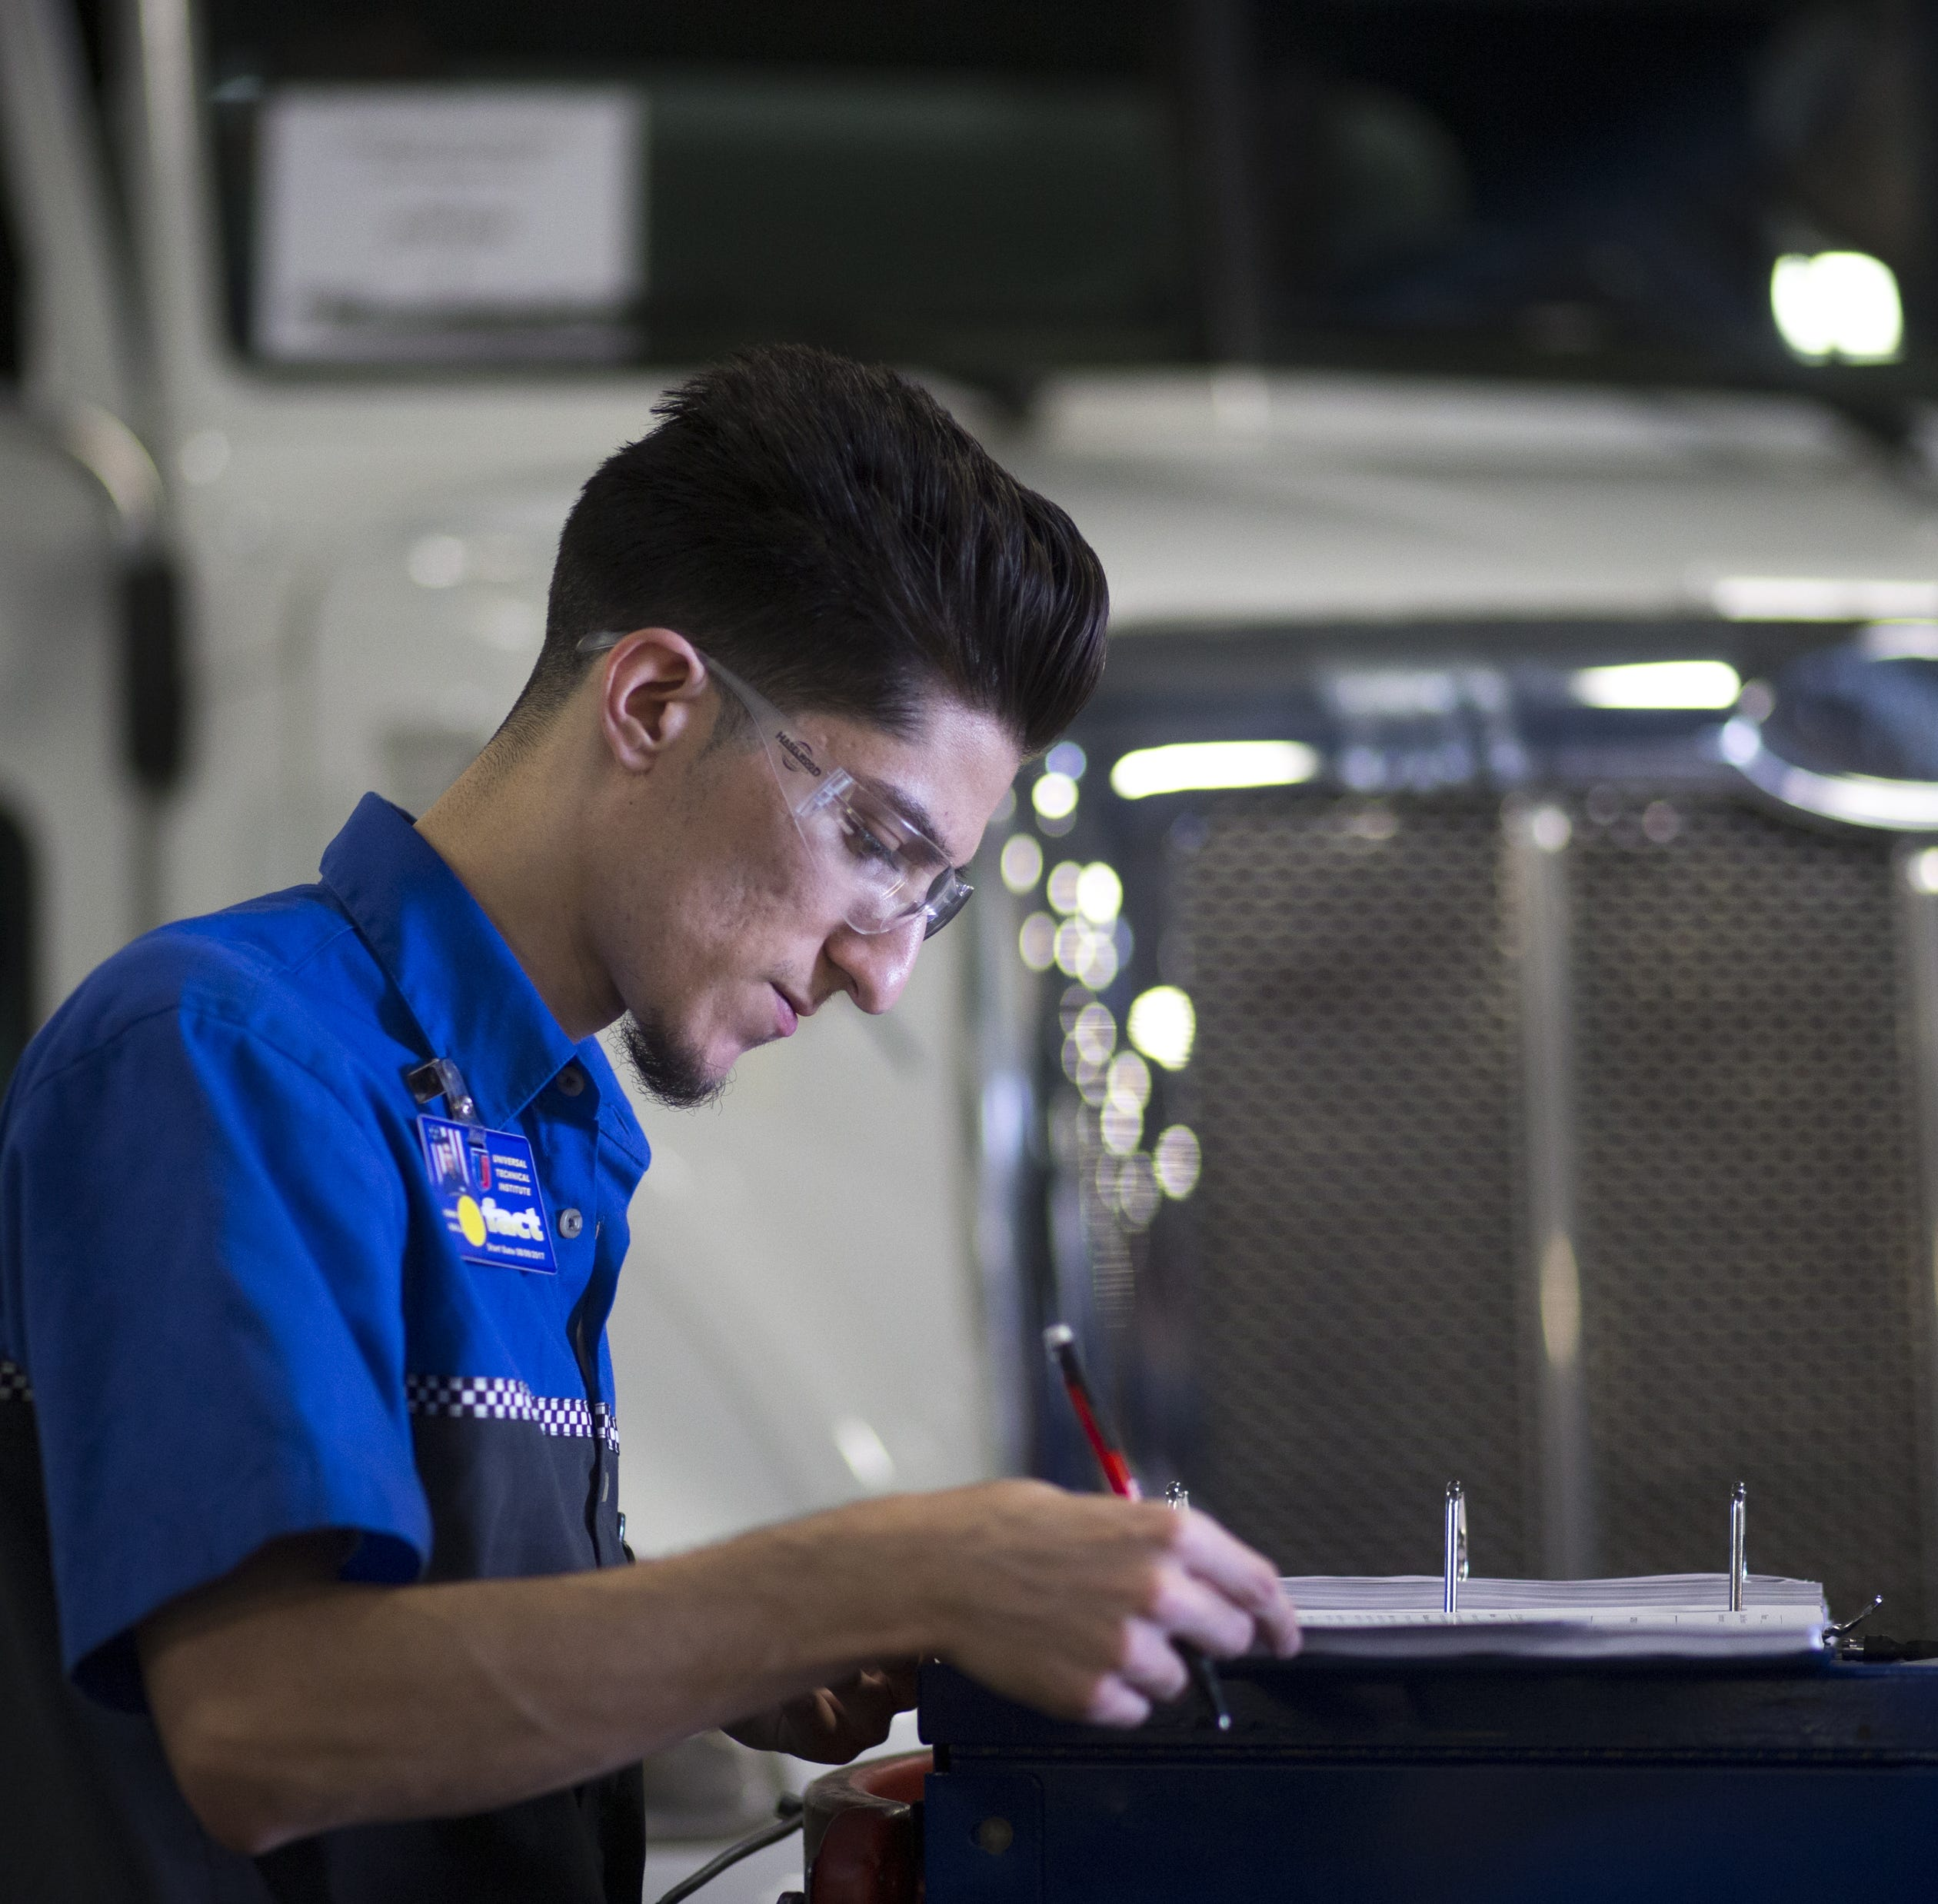 Arizona school seeks to train more mechanics amid looming worker shortage